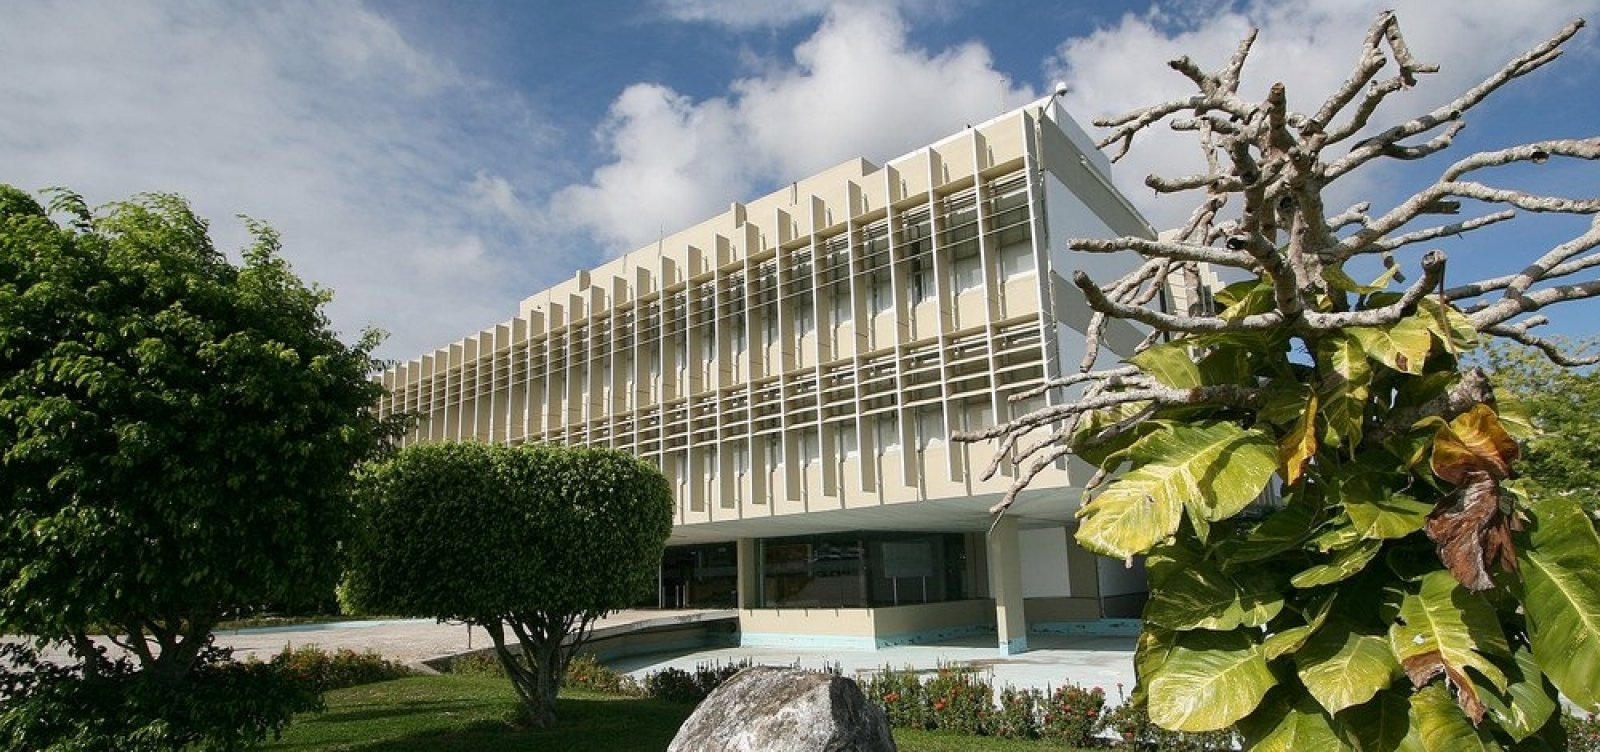 Programa Concilia 2018 oferece desconto de 90% para regularizar ICMS